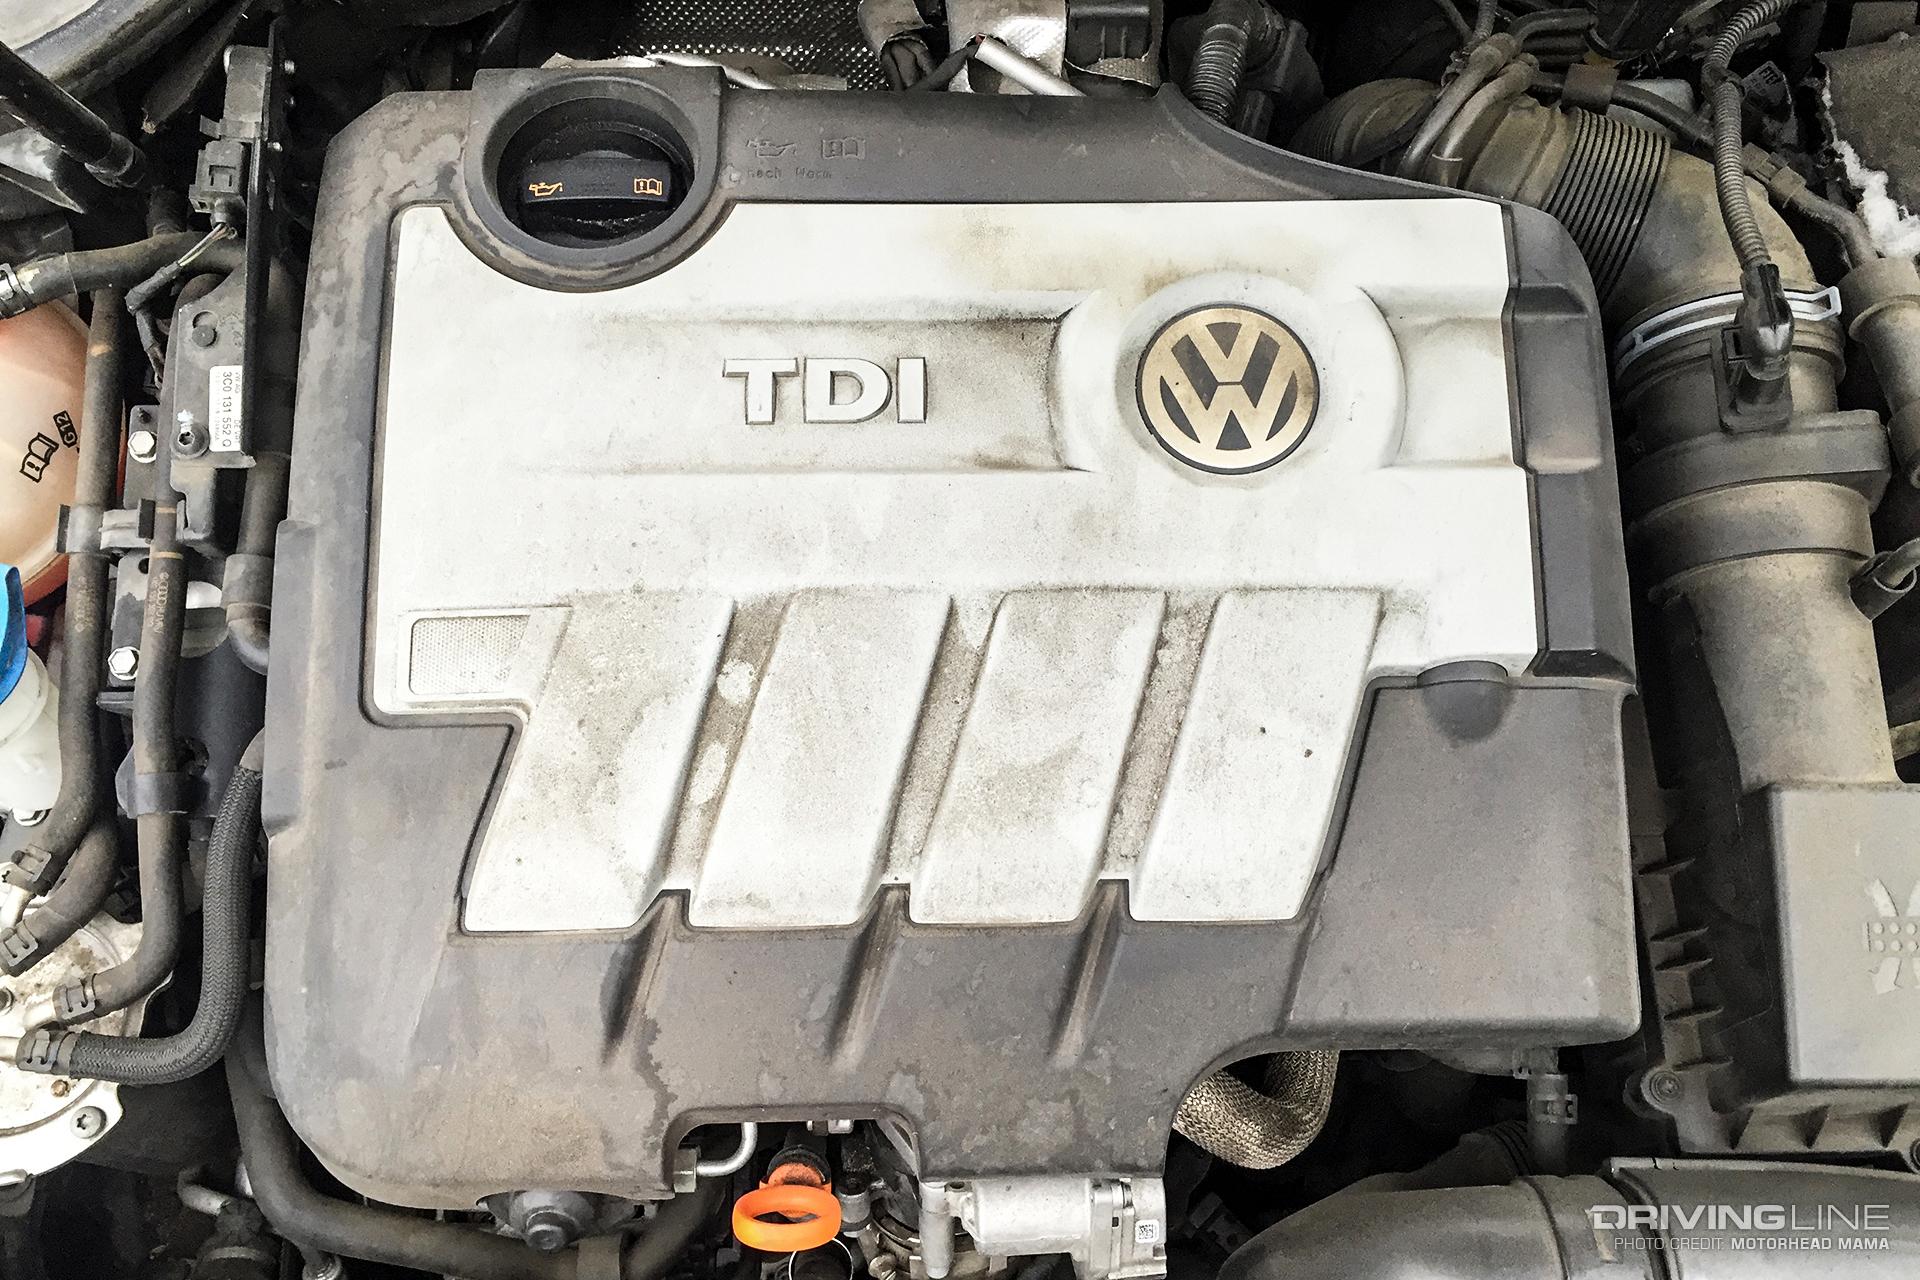 VW Diesel Scandal Settlement How to Make $10k on Your Dirty Diesel